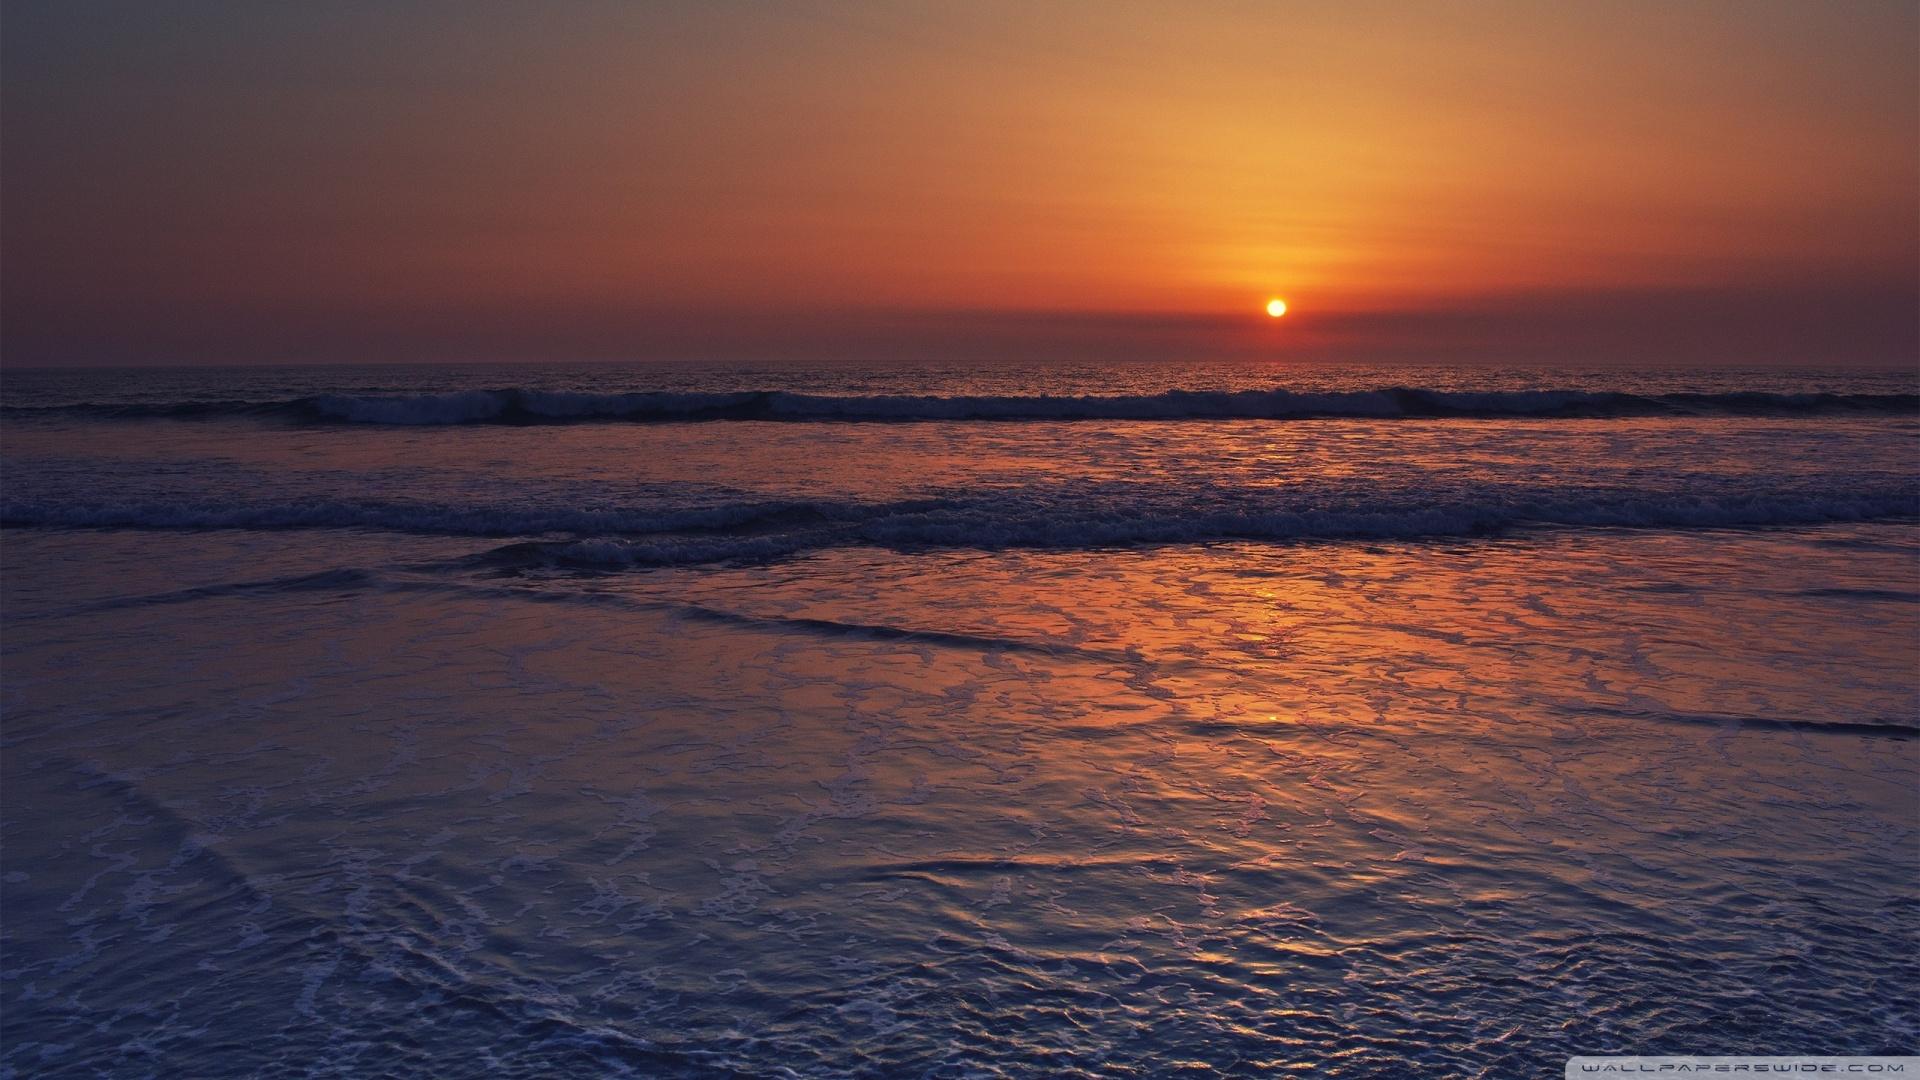 Calming Sunset Desktop Wallpapers 1920x1080